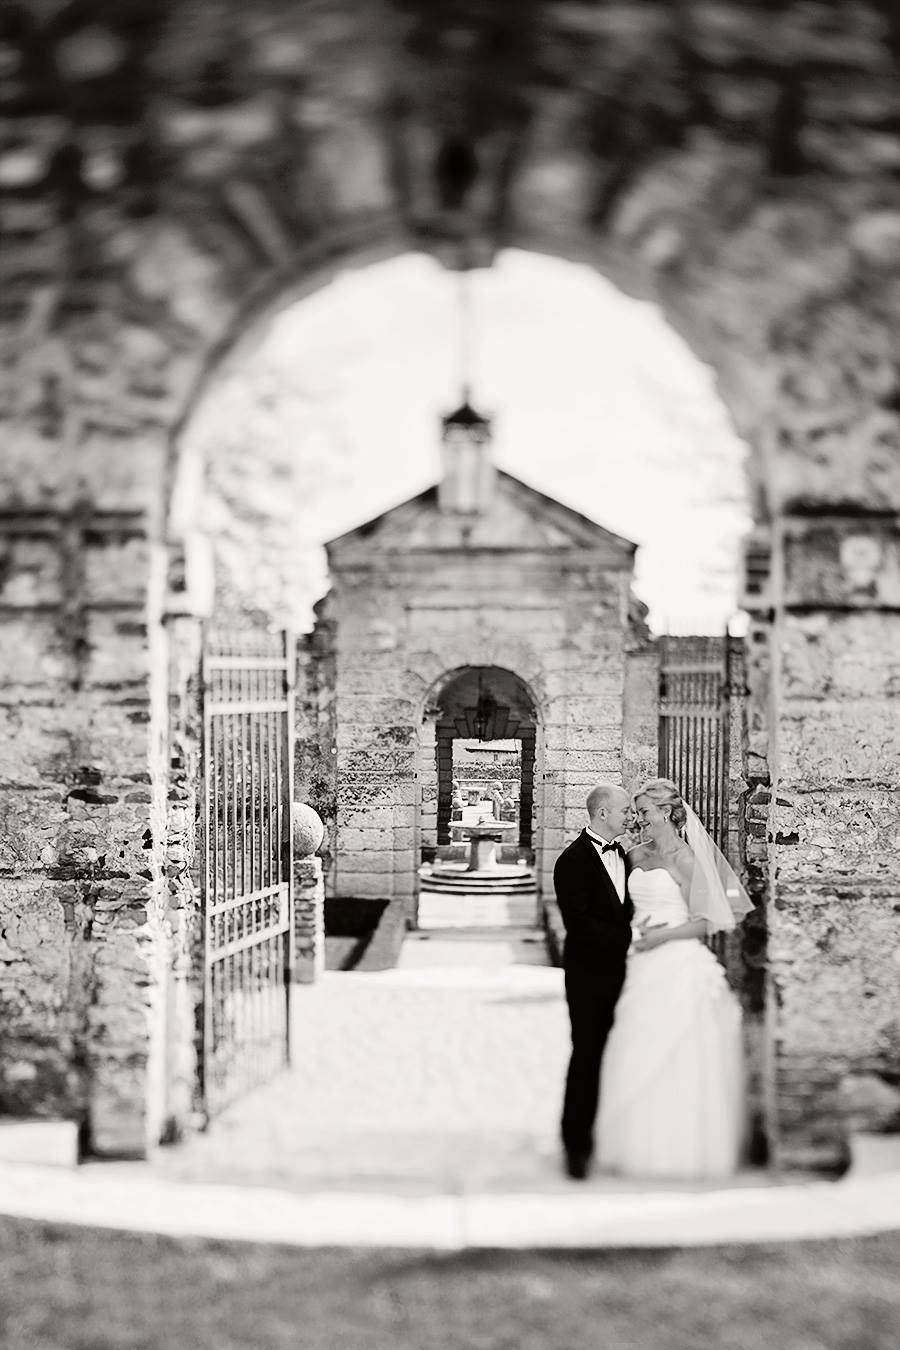 Susanne & Marcus -Villa della Torre in Valpolicella, Italy